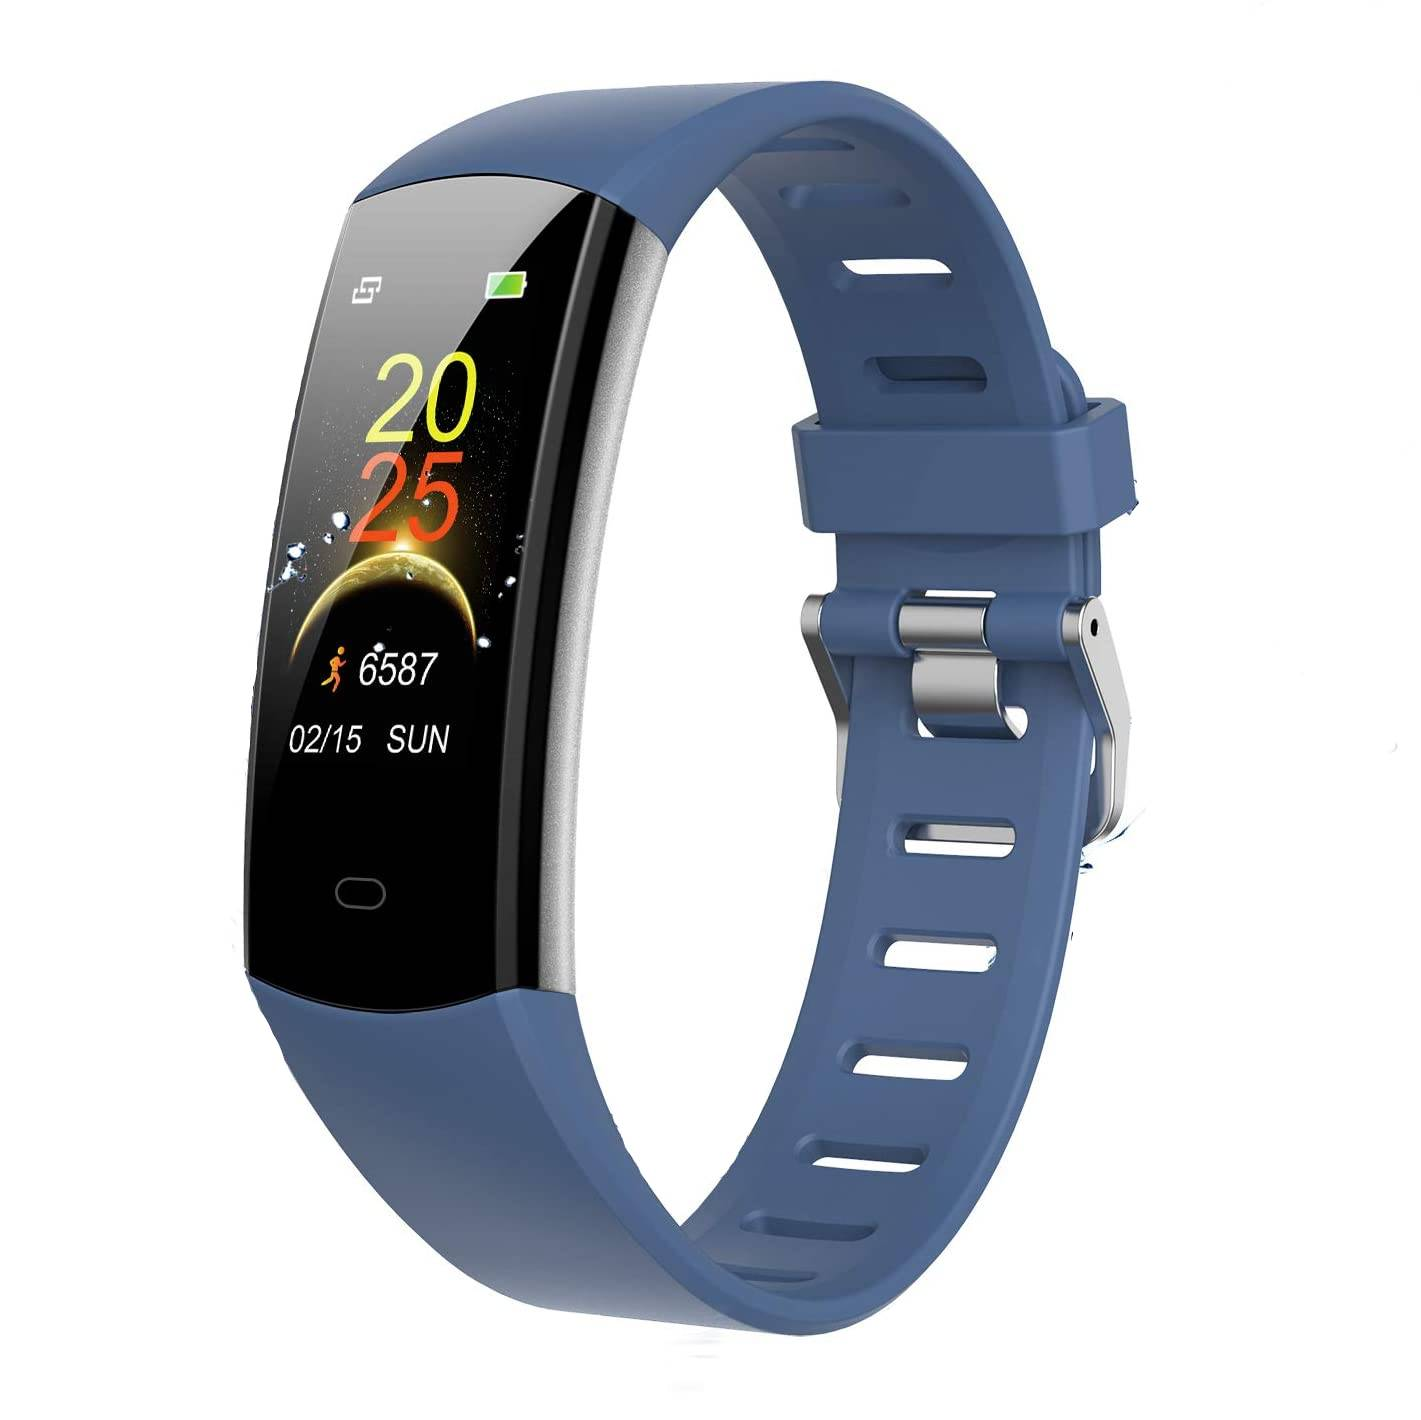 BINGOFIT SLIM - Best Fitness Tracker For Kids